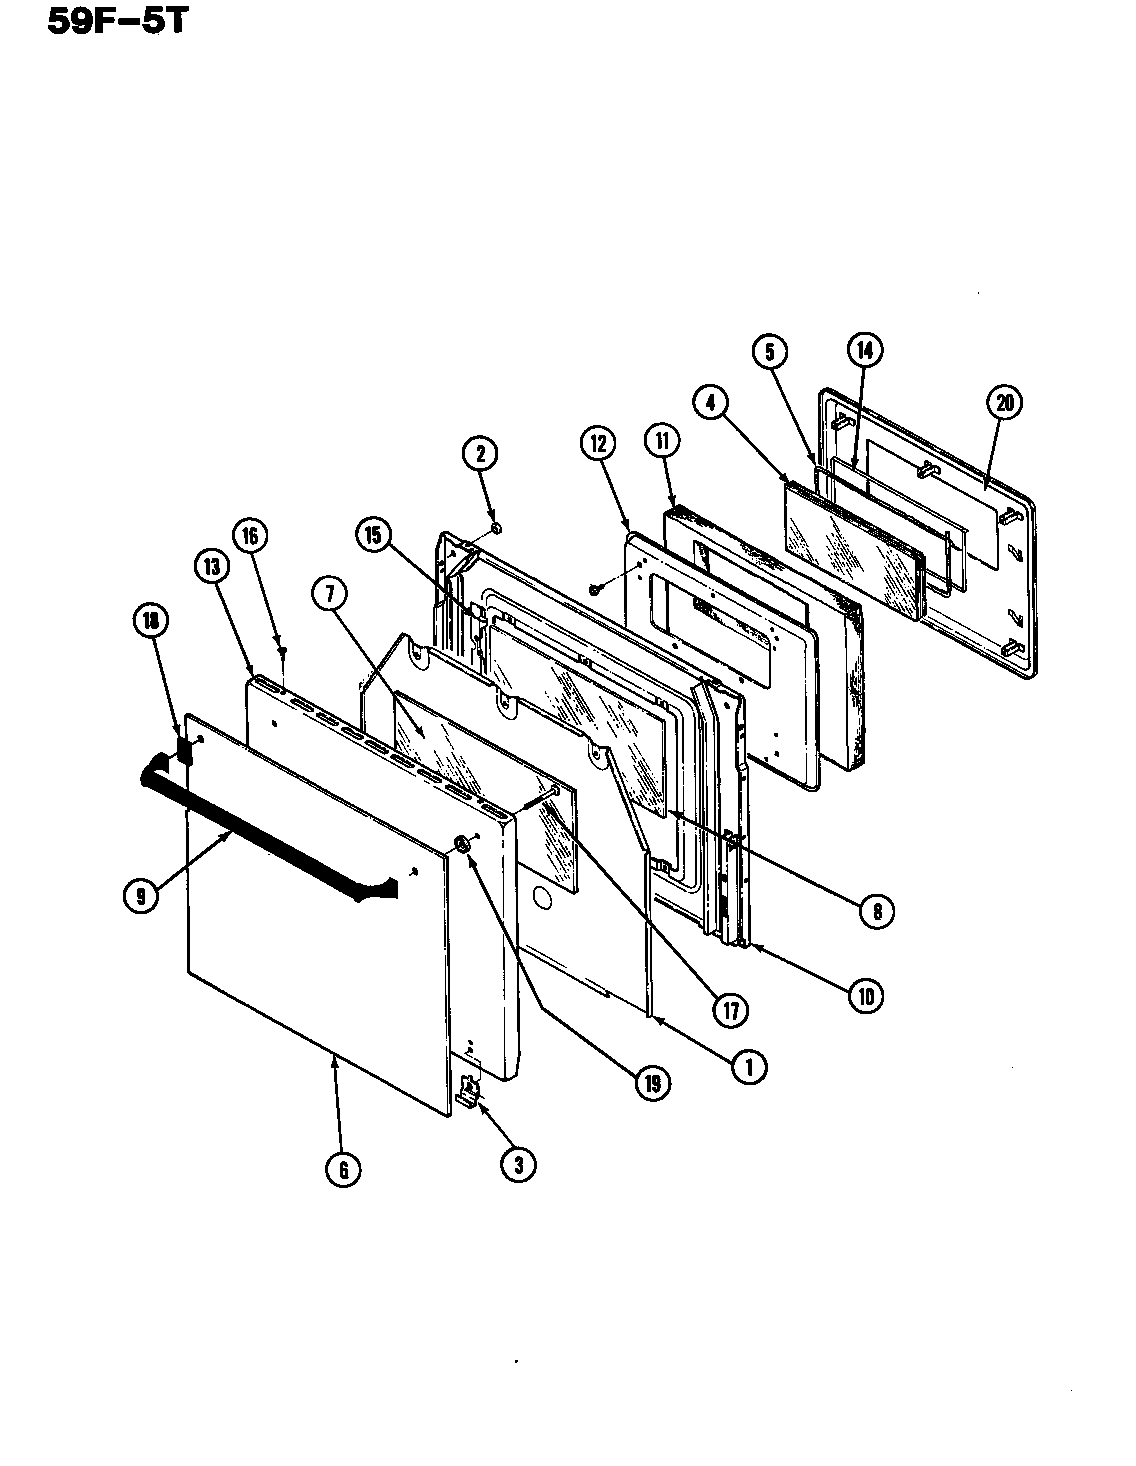 DOOR Diagram & Parts List for Model 59fn5tvw Magic-chef